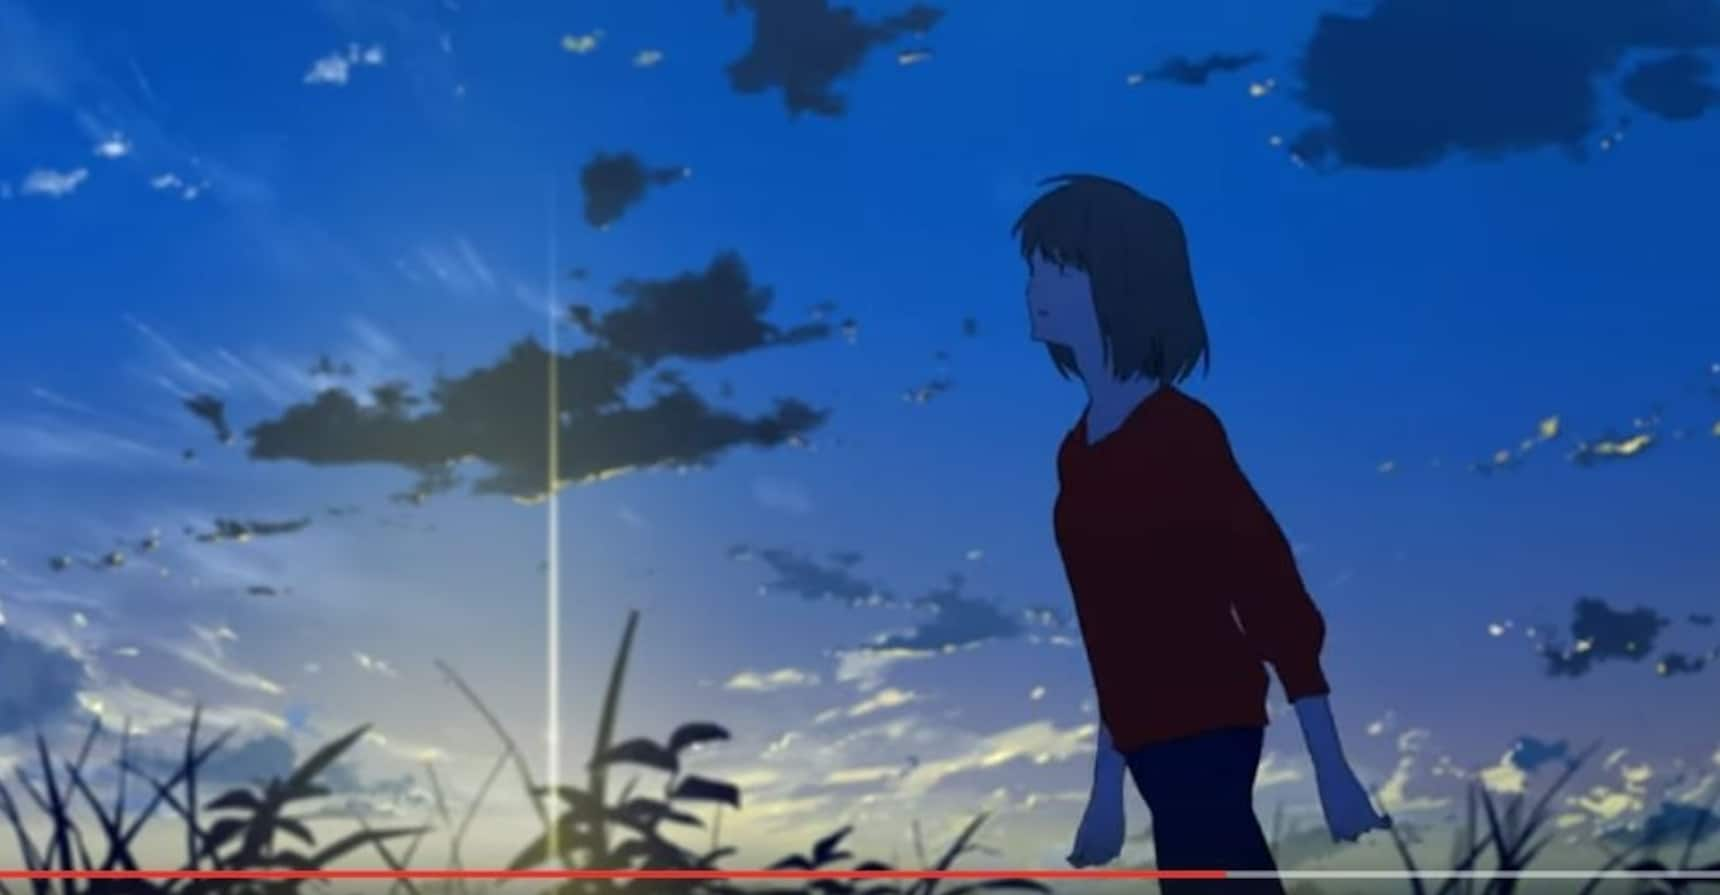 Anime Artist Creates Stunning Movie Trailer